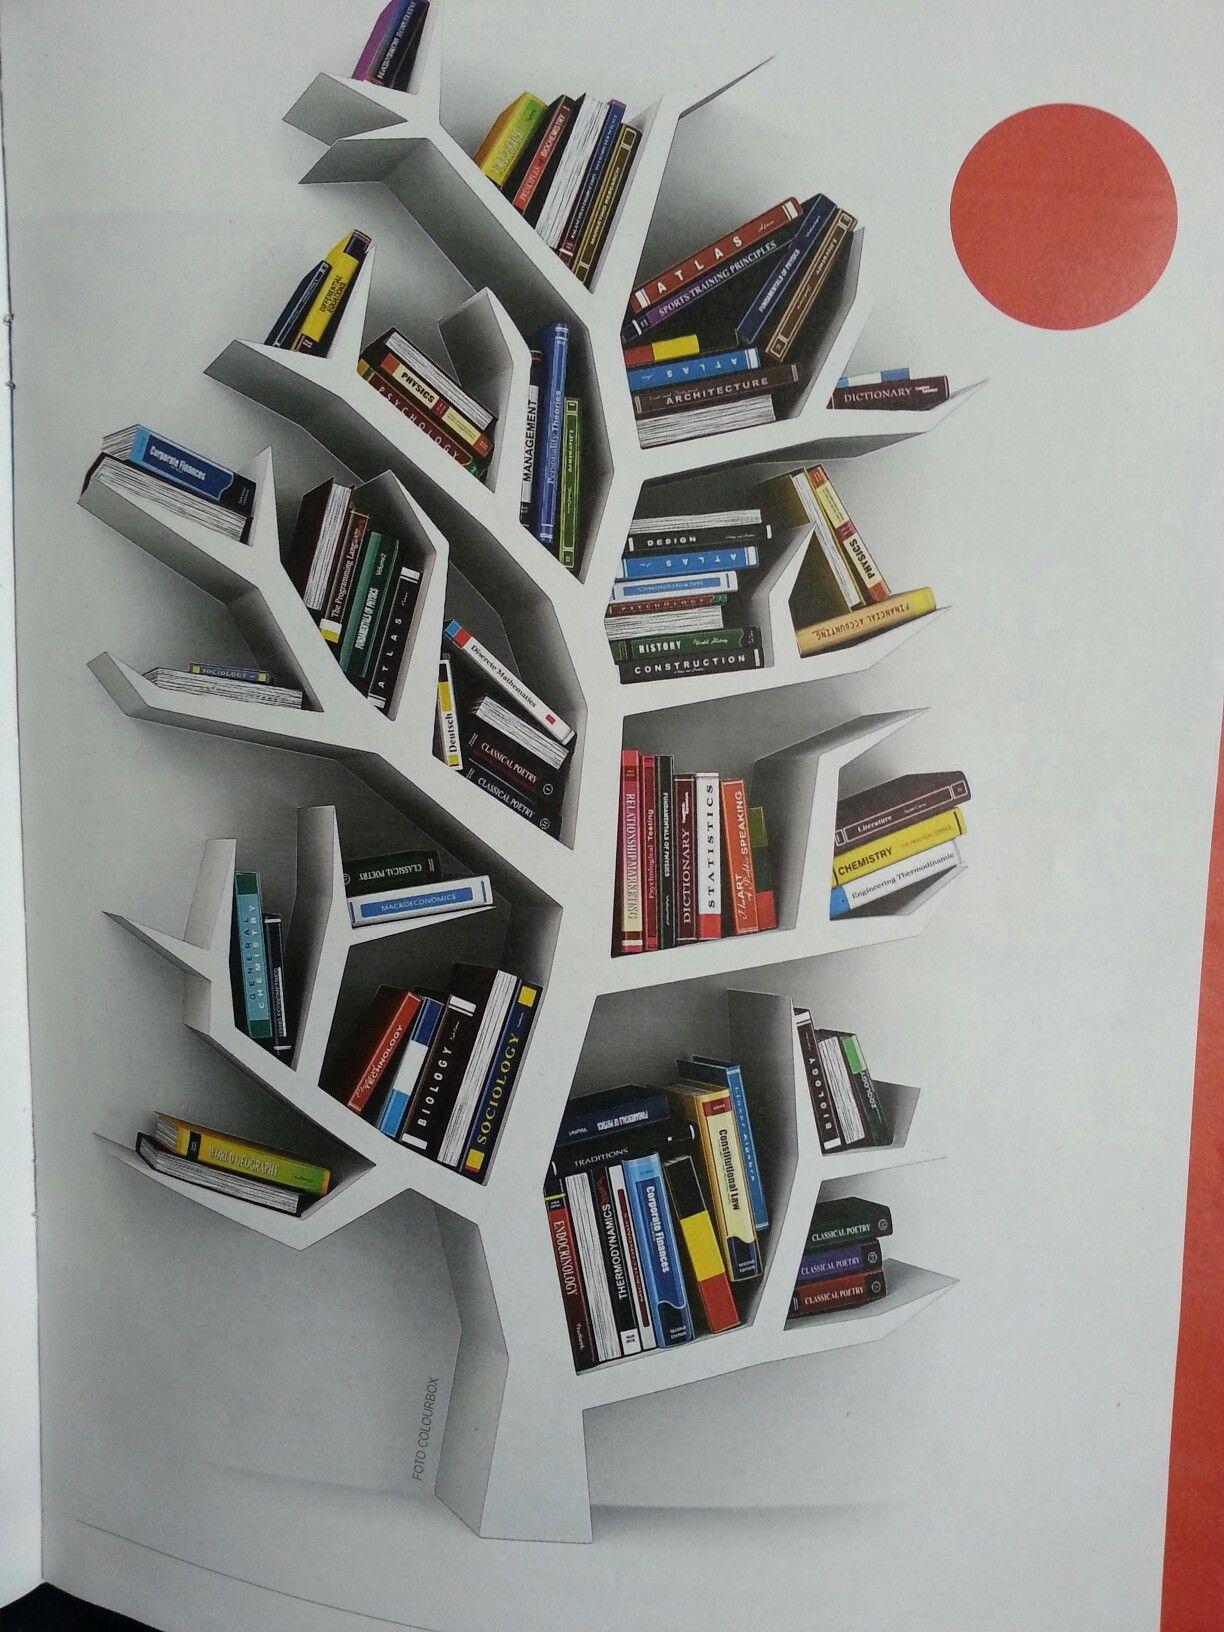 Bookshelf Books Kids Wall Bookshelves Tree Book Shelves